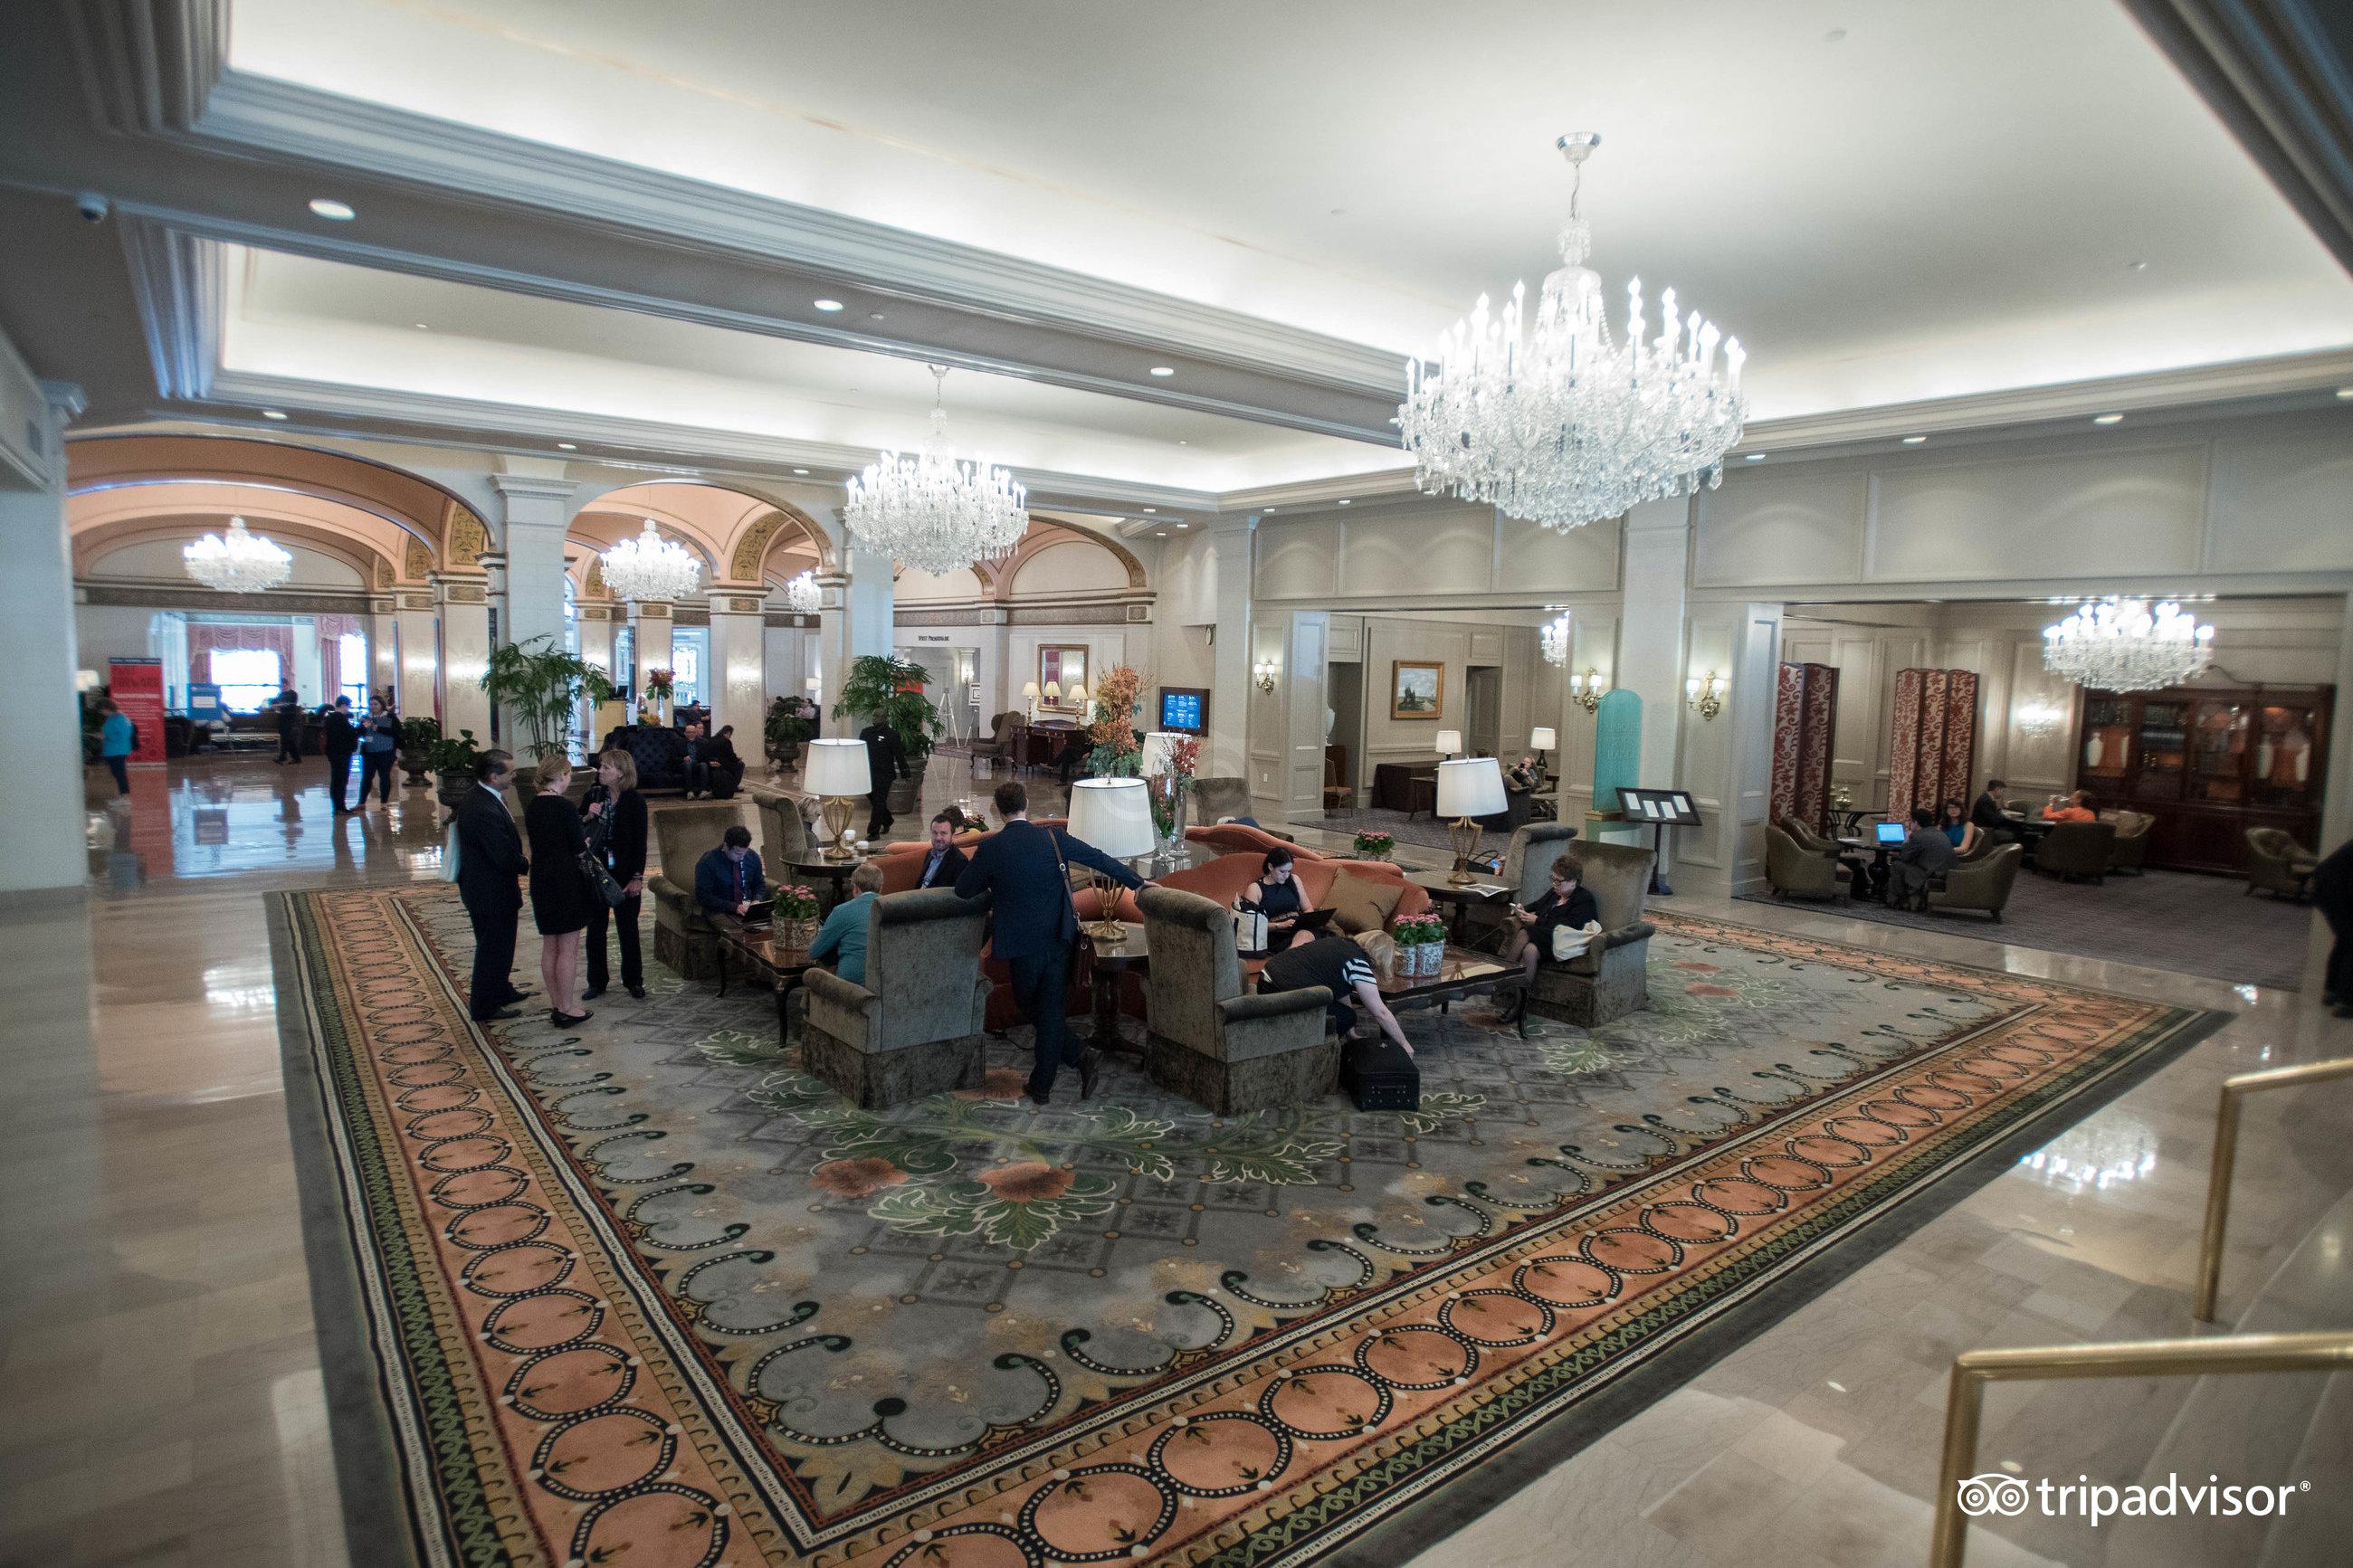 Washington Dc Map Of Attractions%0A Omni Shoreham Hotel  Washington  DC       Review  u     Ratings  Family  Vacation Critic